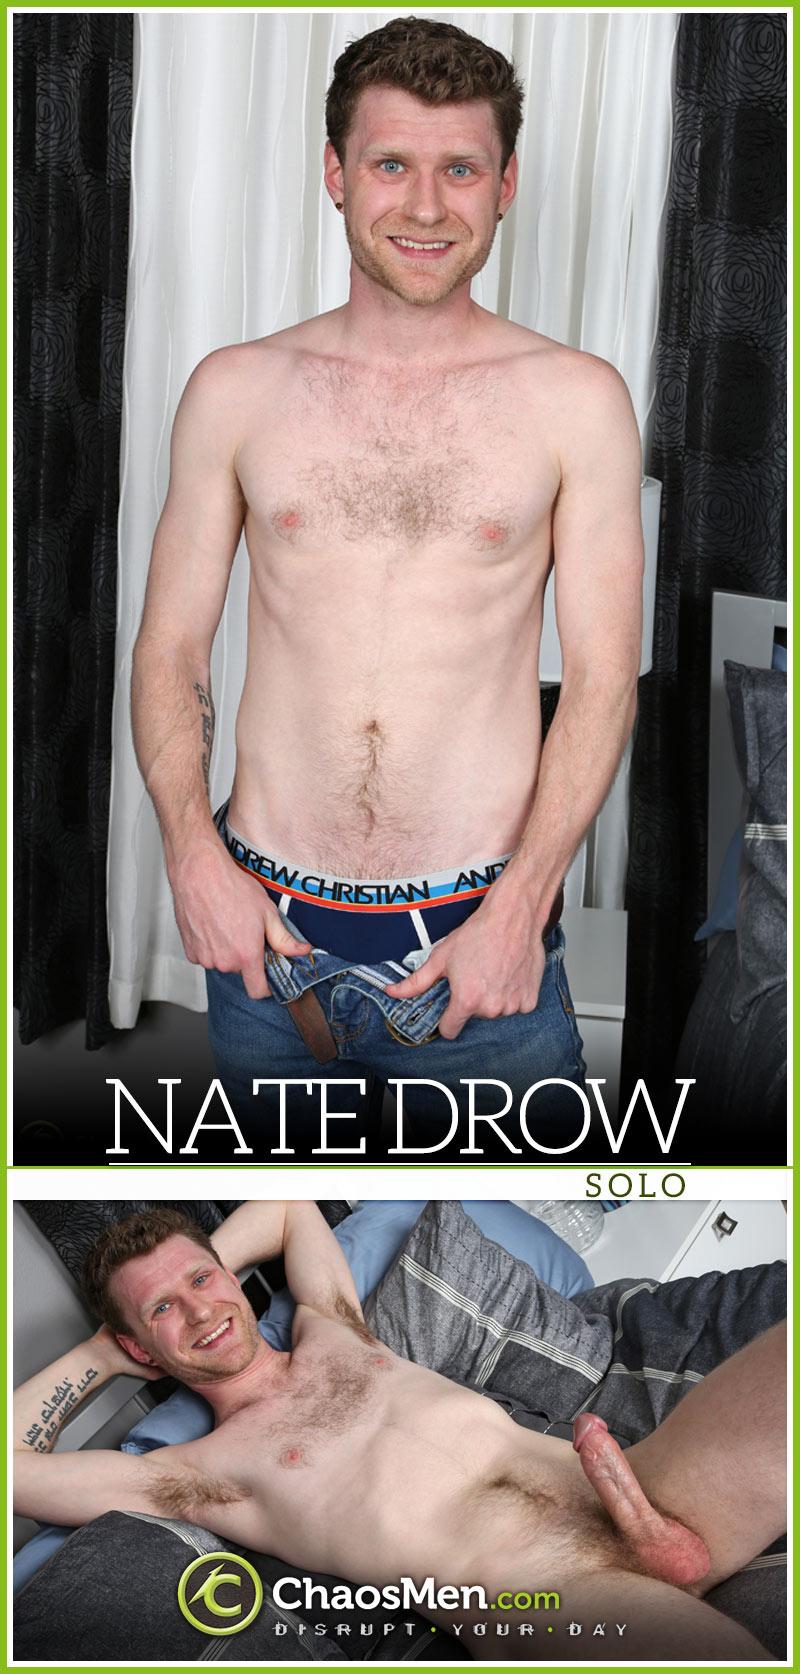 Nate Drow [Solo] at ChaosMen